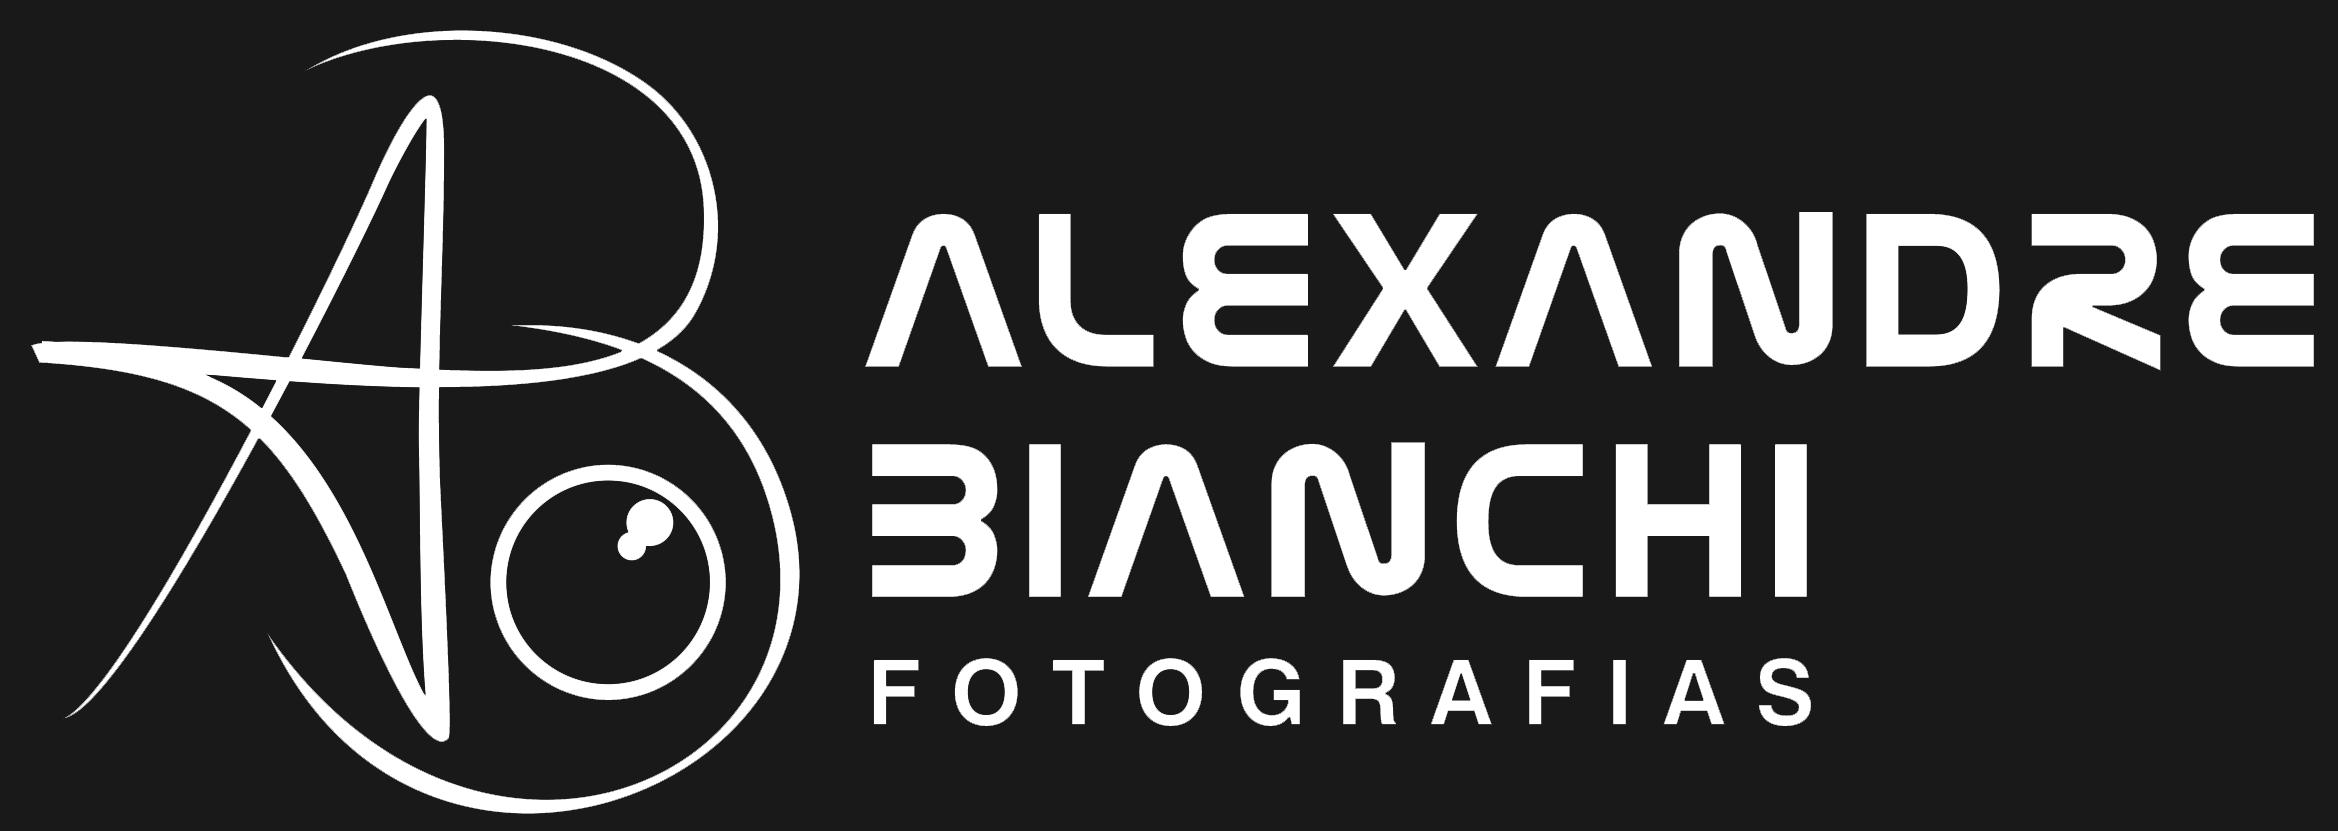 Alexandre Bianchi